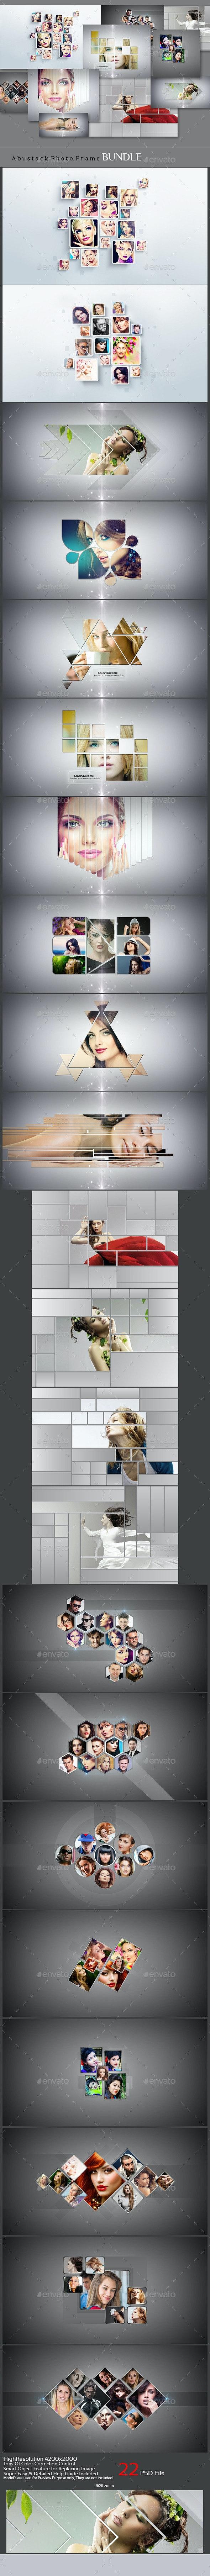 Abstrakt Photo Frame Bundle - Photo Templates Graphics